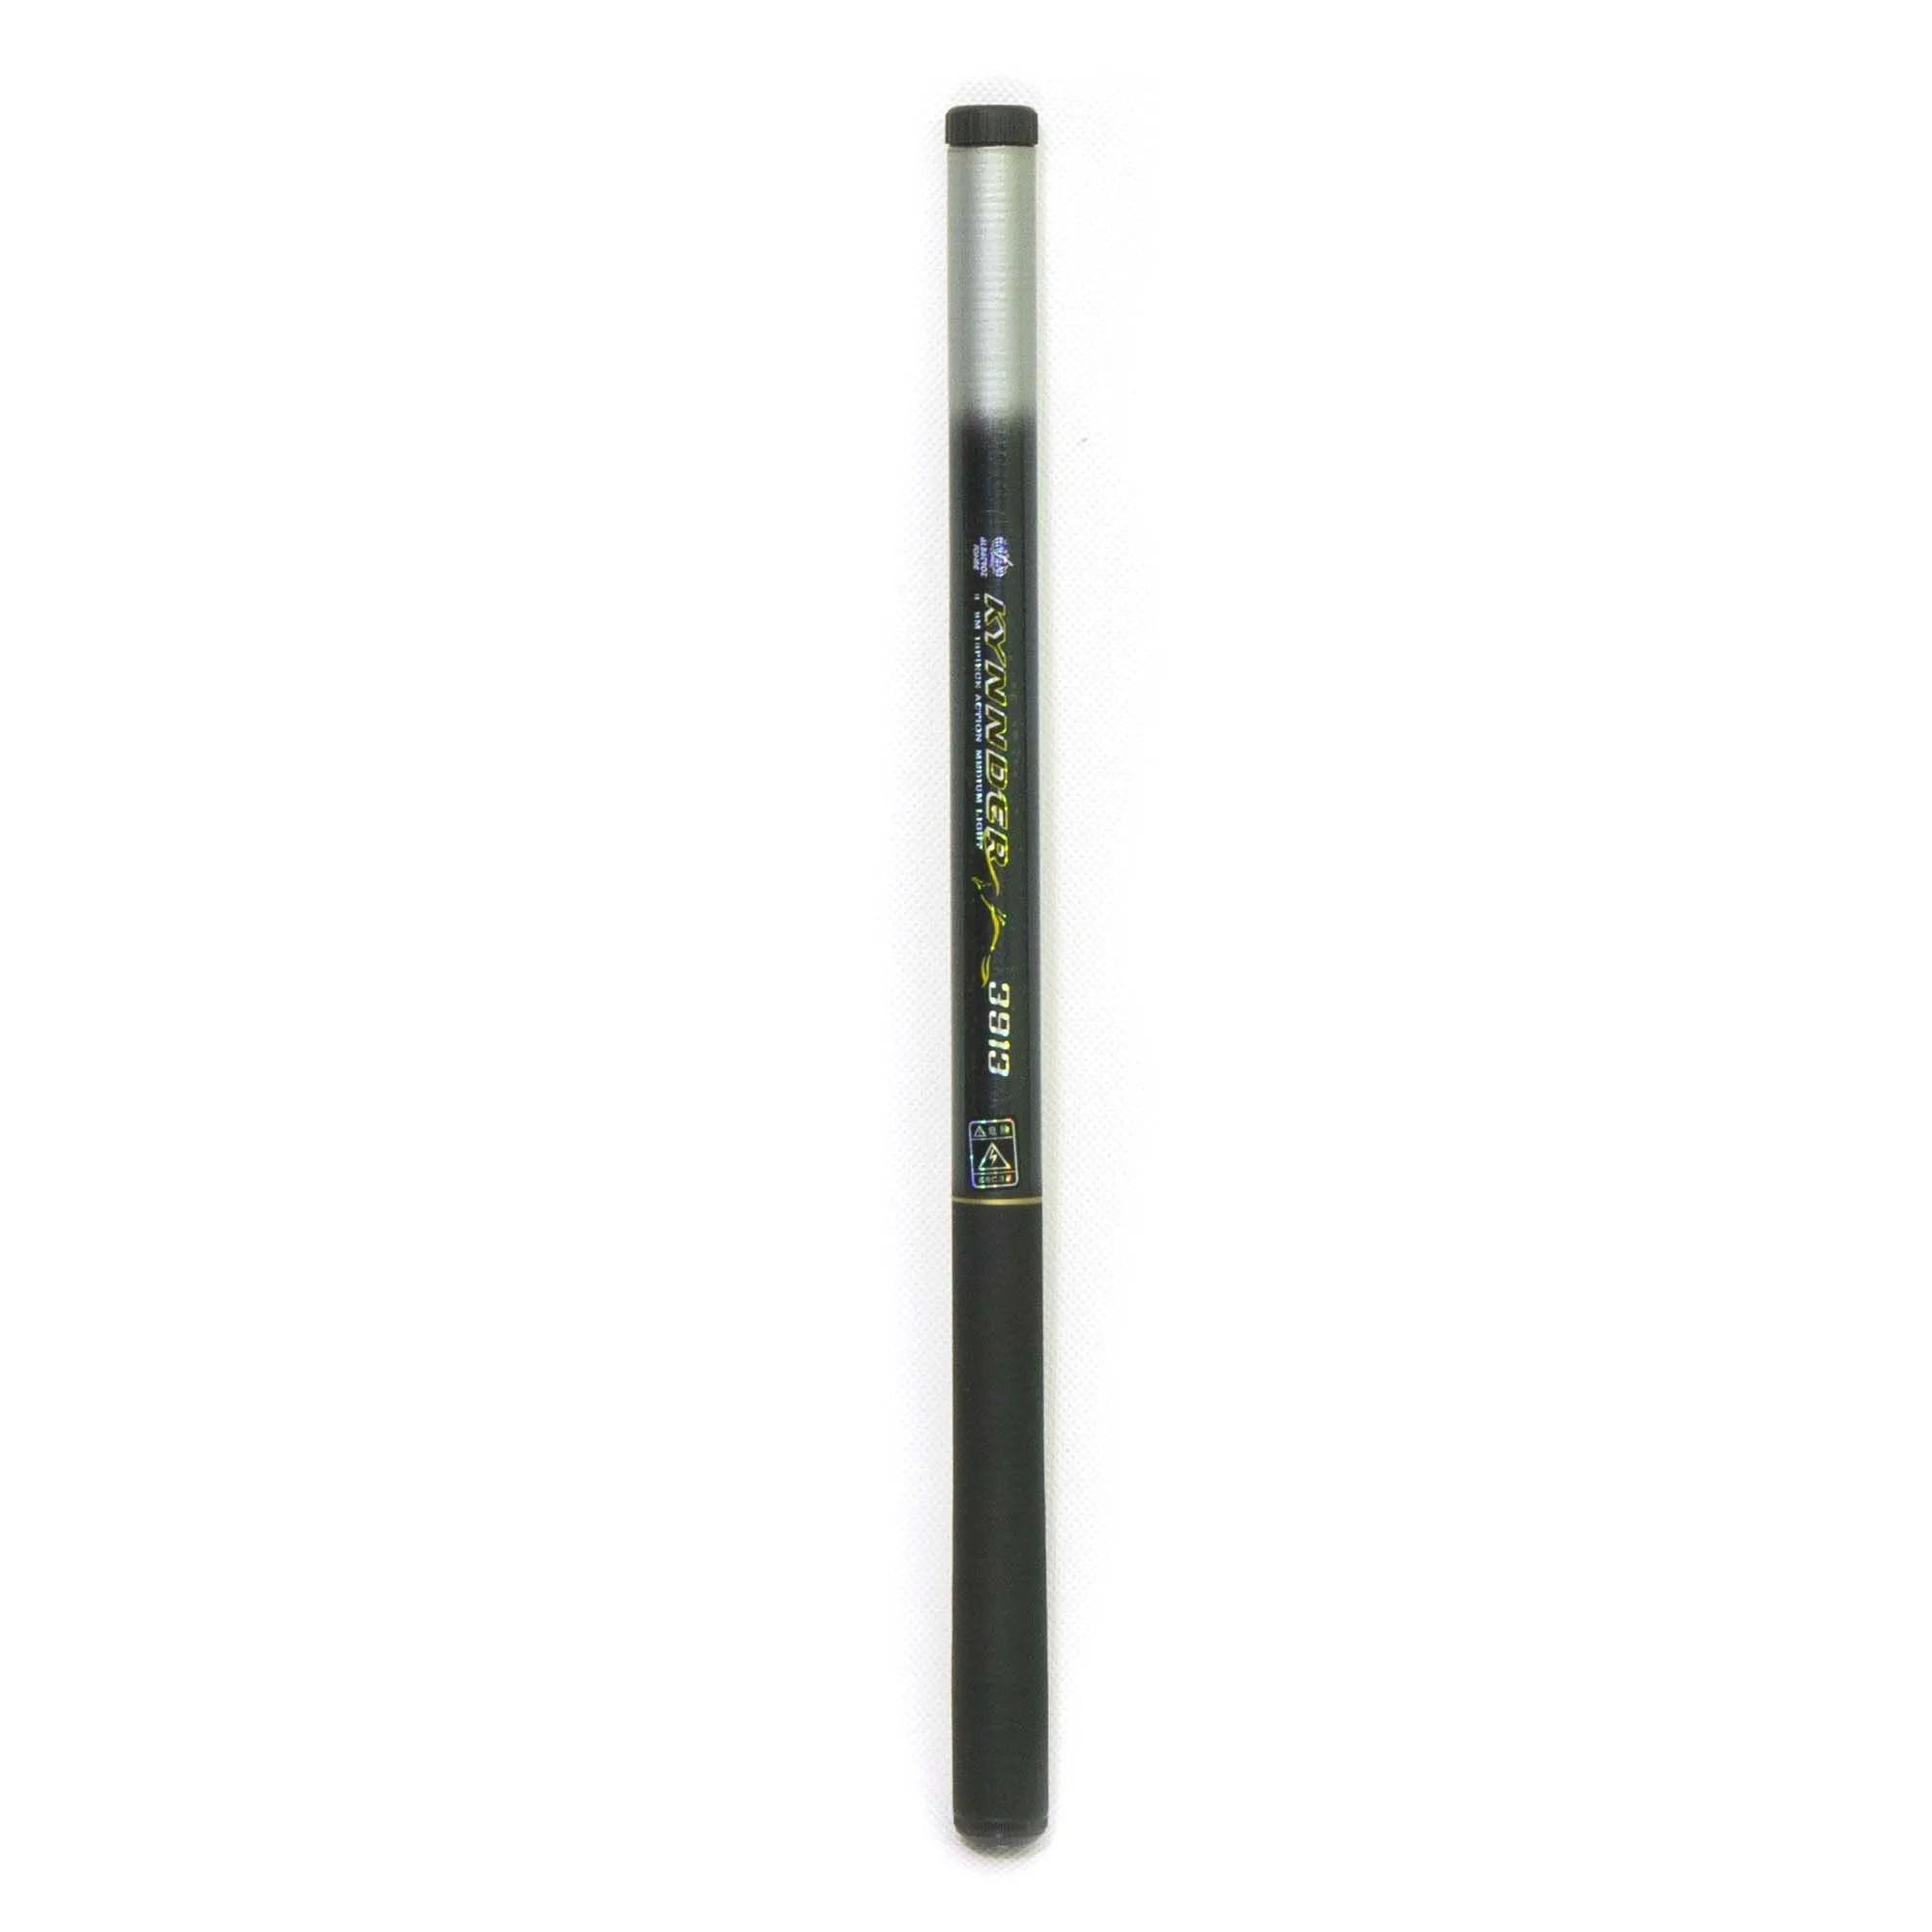 Vara Telescópica uso sem Molinete Kynnder 45% Carbono 3,60m - 12P  - Artpesca